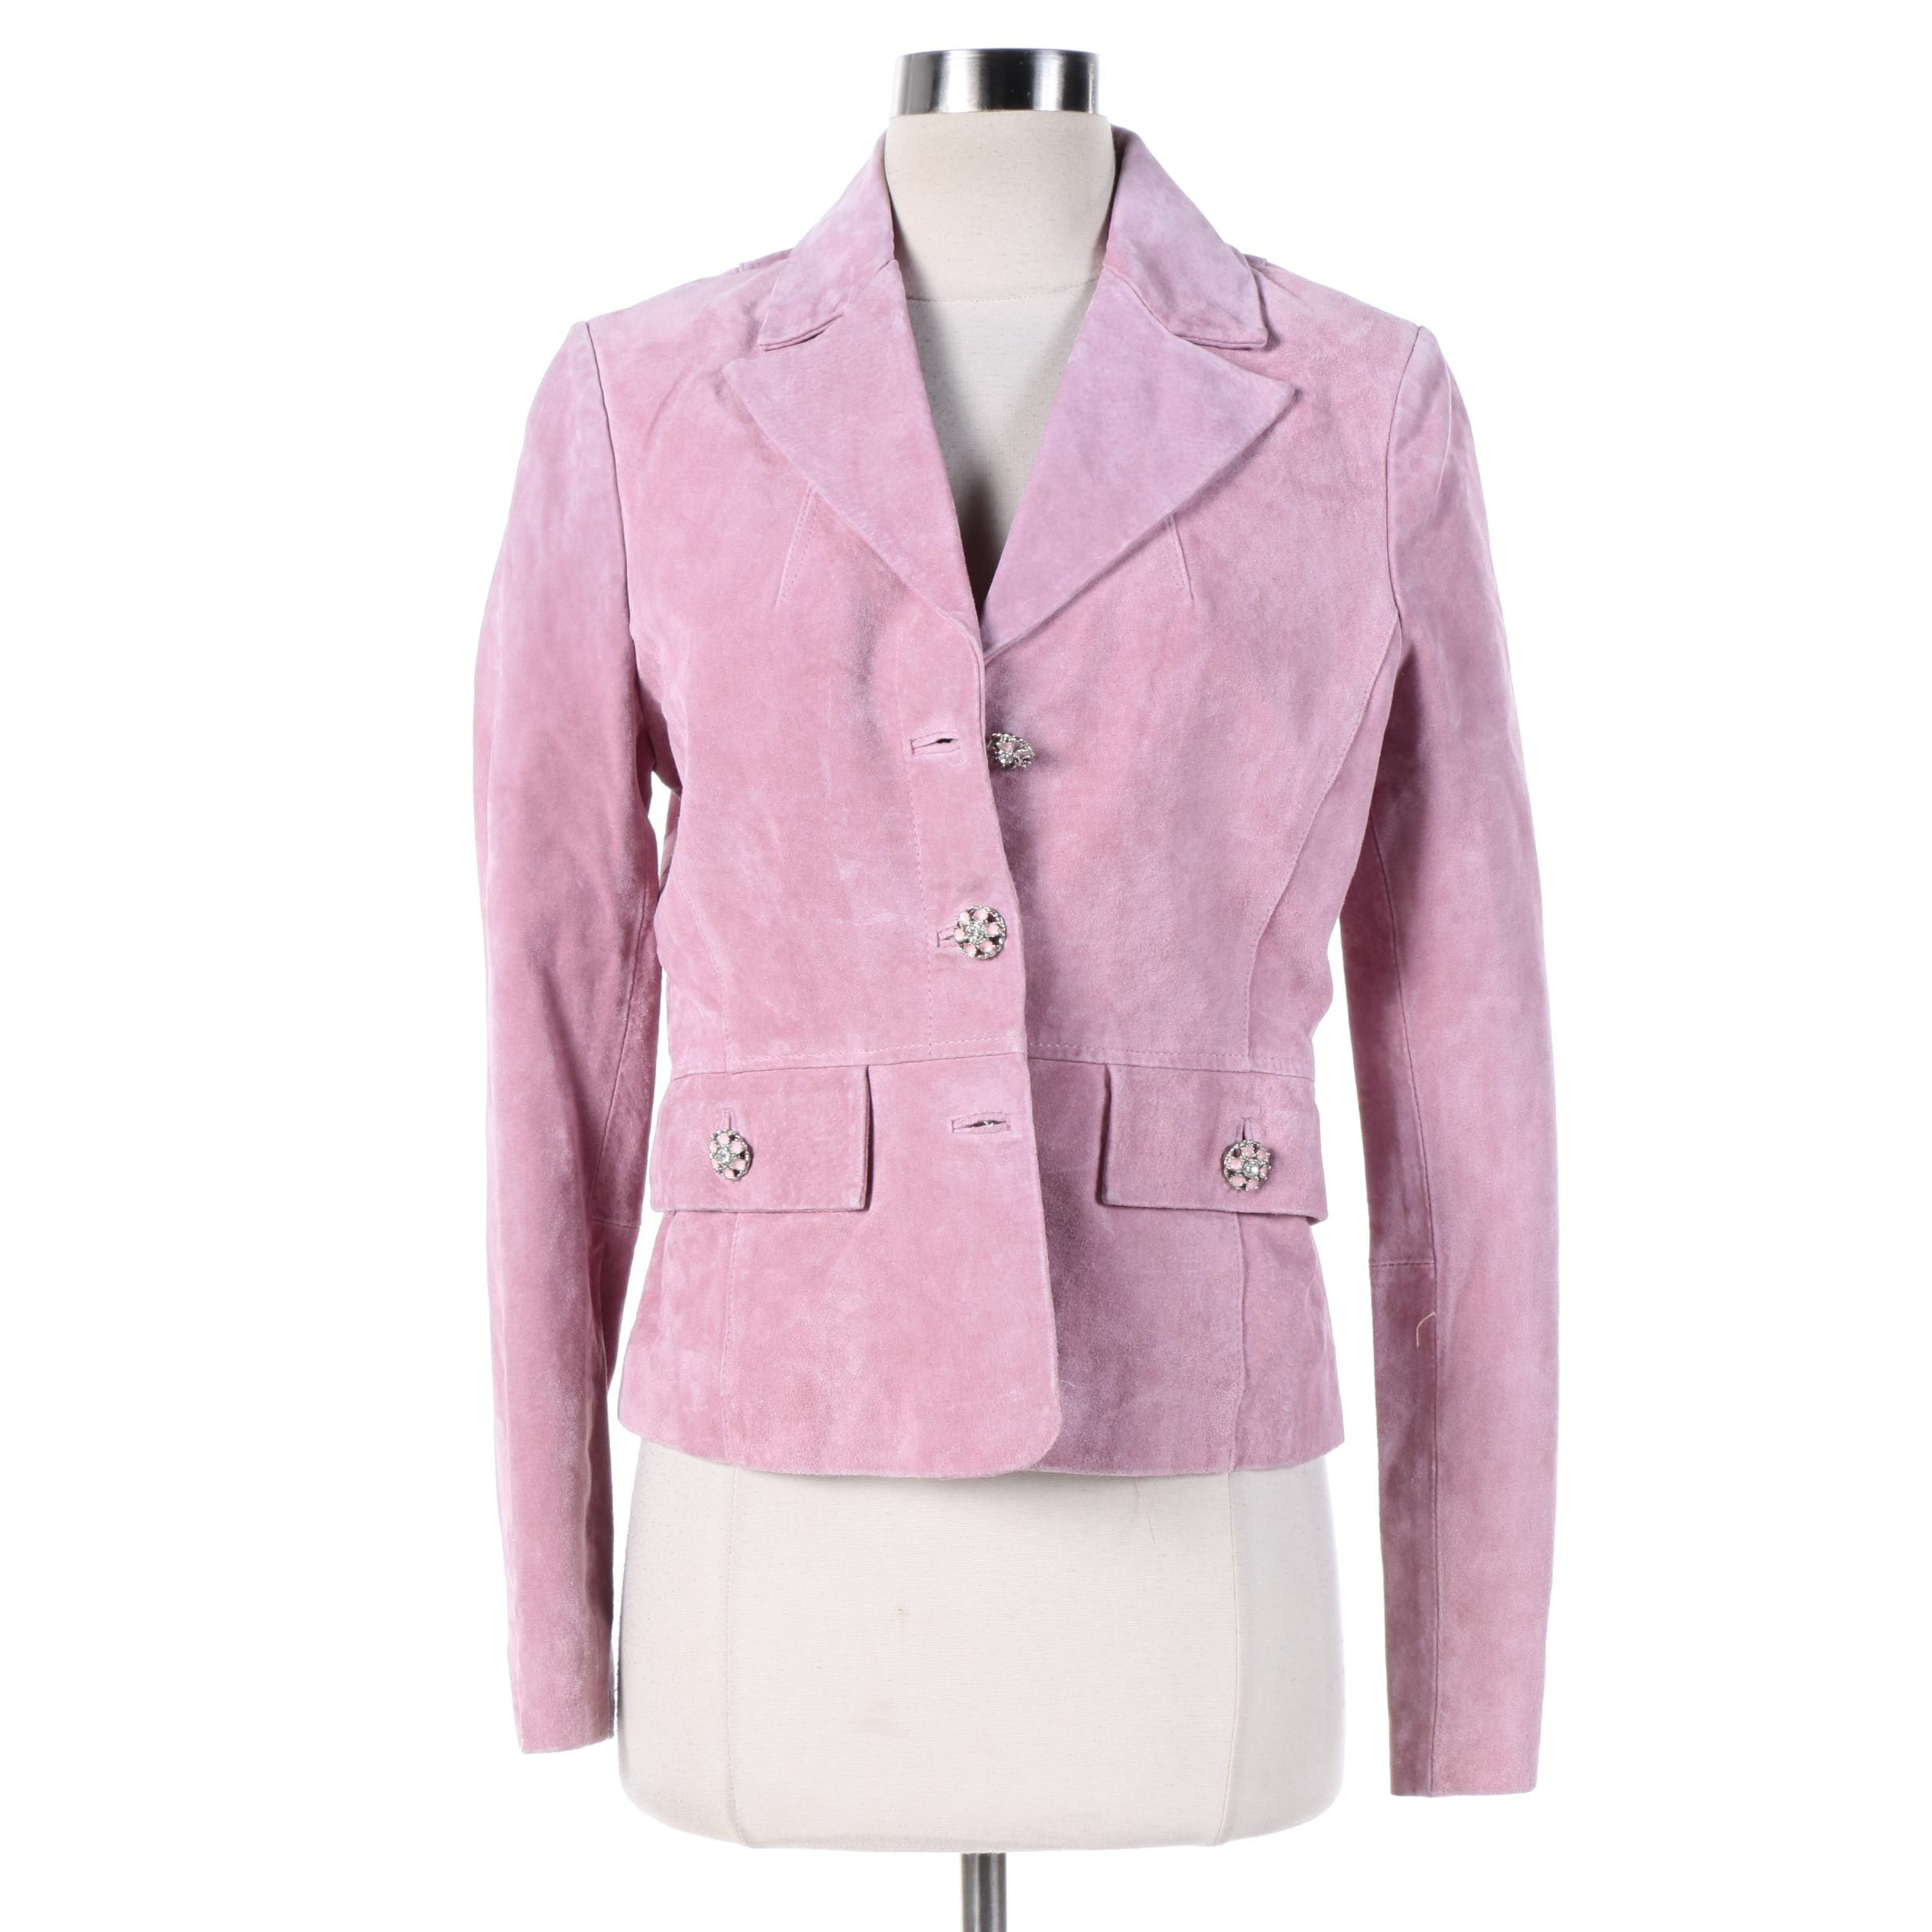 Women's XOXO Pink Suede Jacket with Rhinestone Embellishments